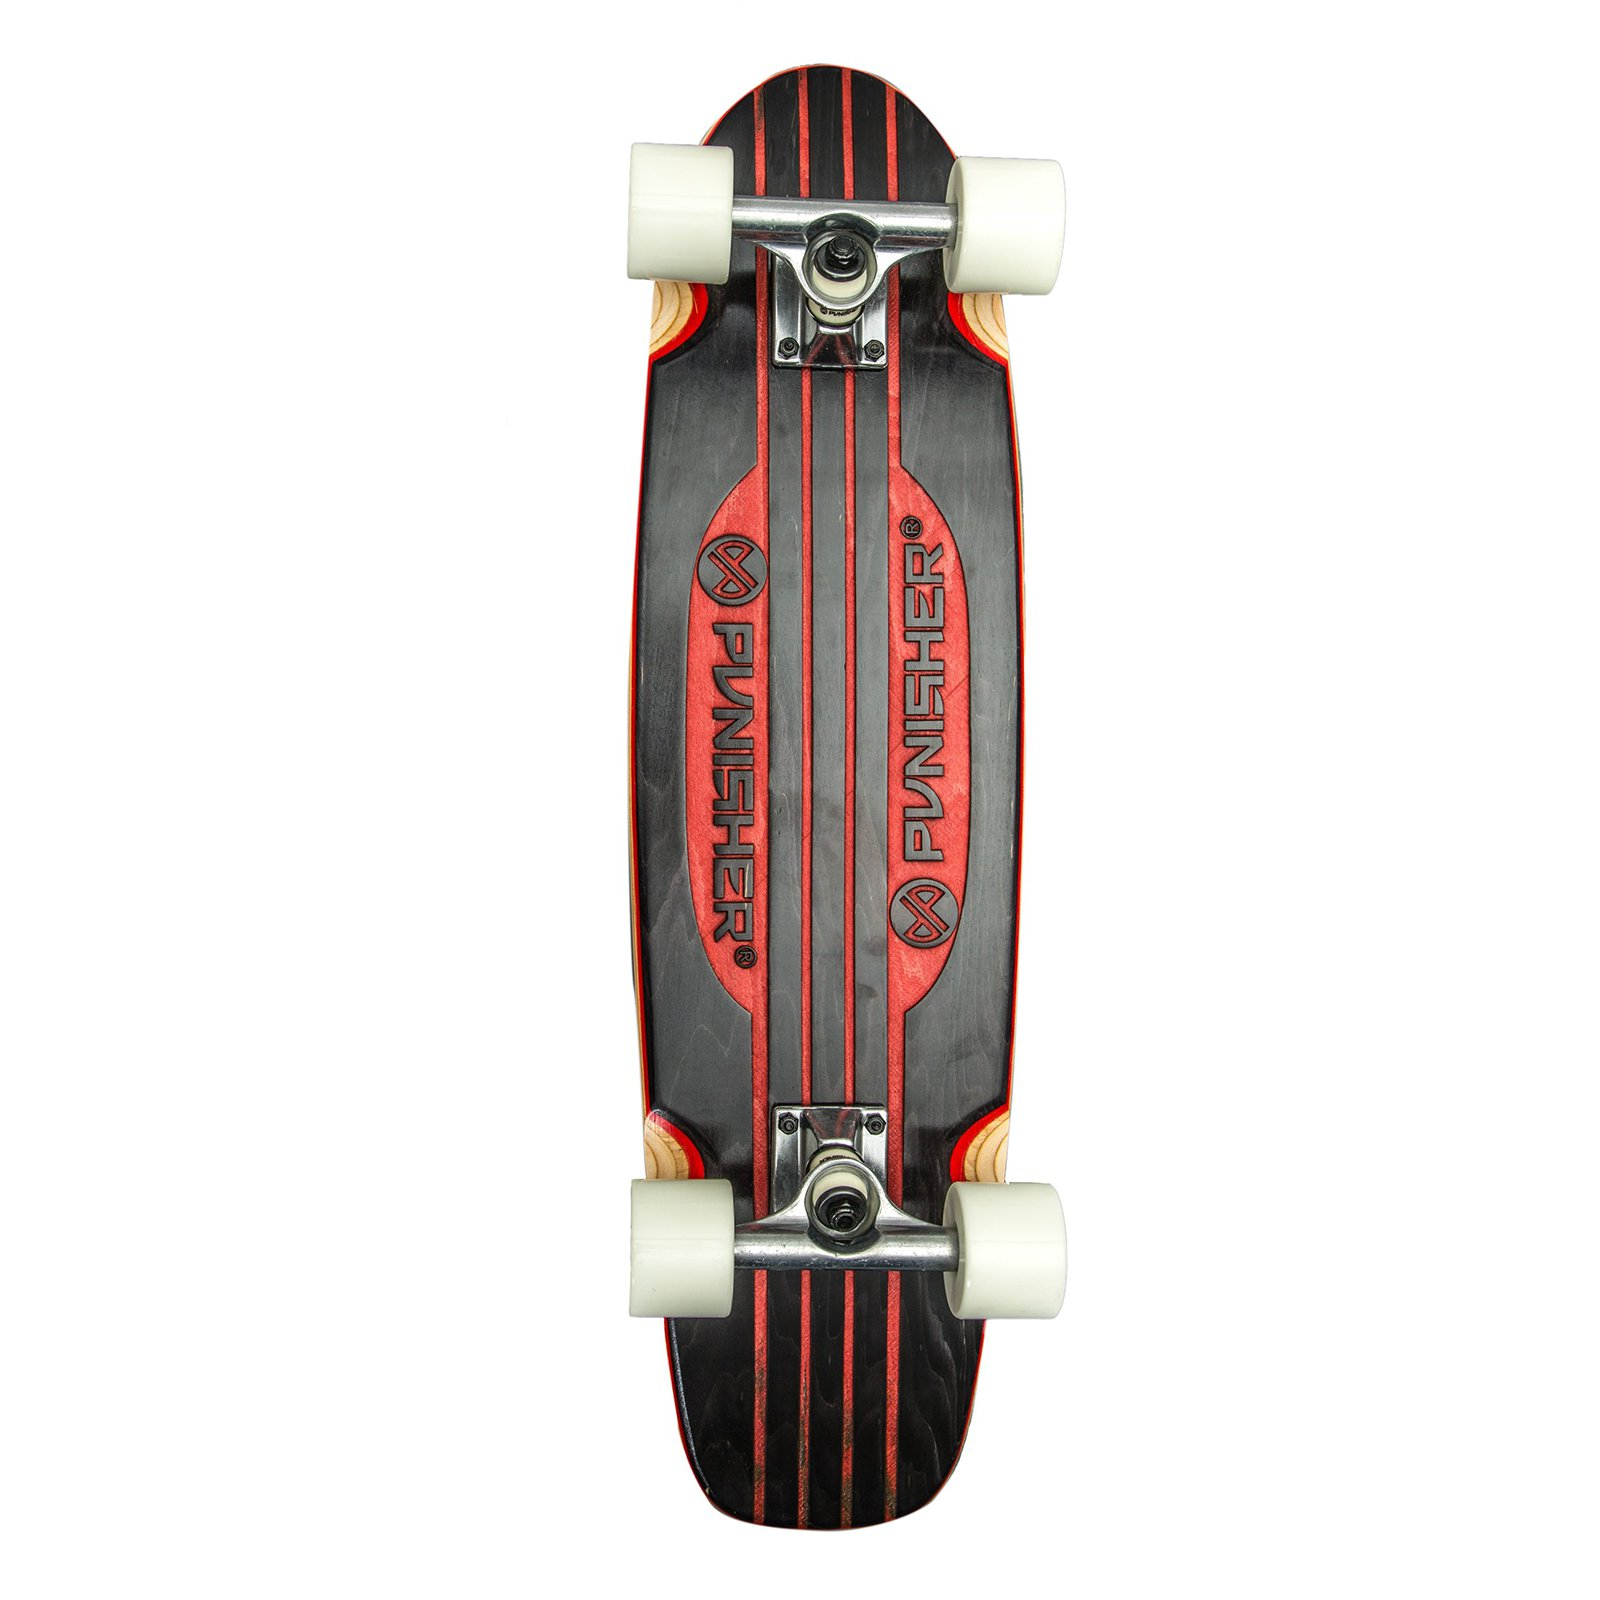 "Punisher Skateboards Special Edition Engraved 28"" Longboard Skateboard, Red by Punisher Skateboards"